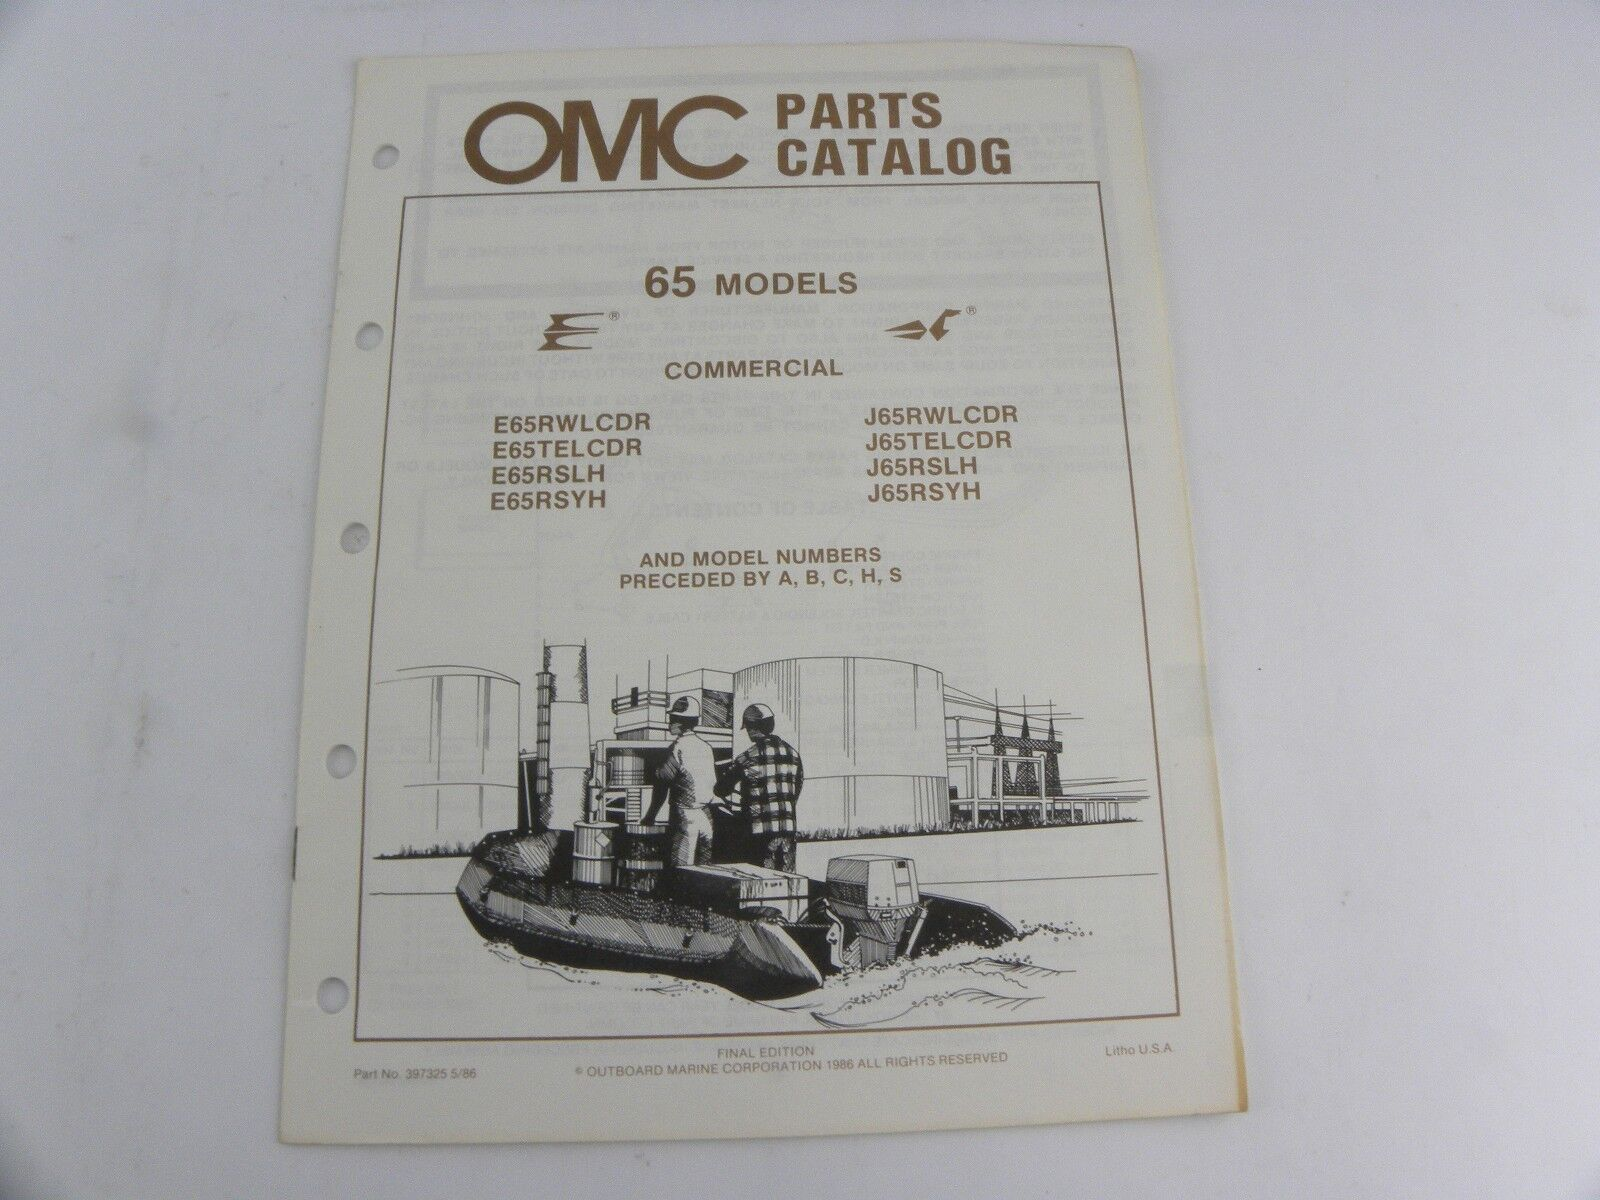 Evinrude Johnson 65 Models Outboard Motor Parts Catalog Manual 1986 OMC